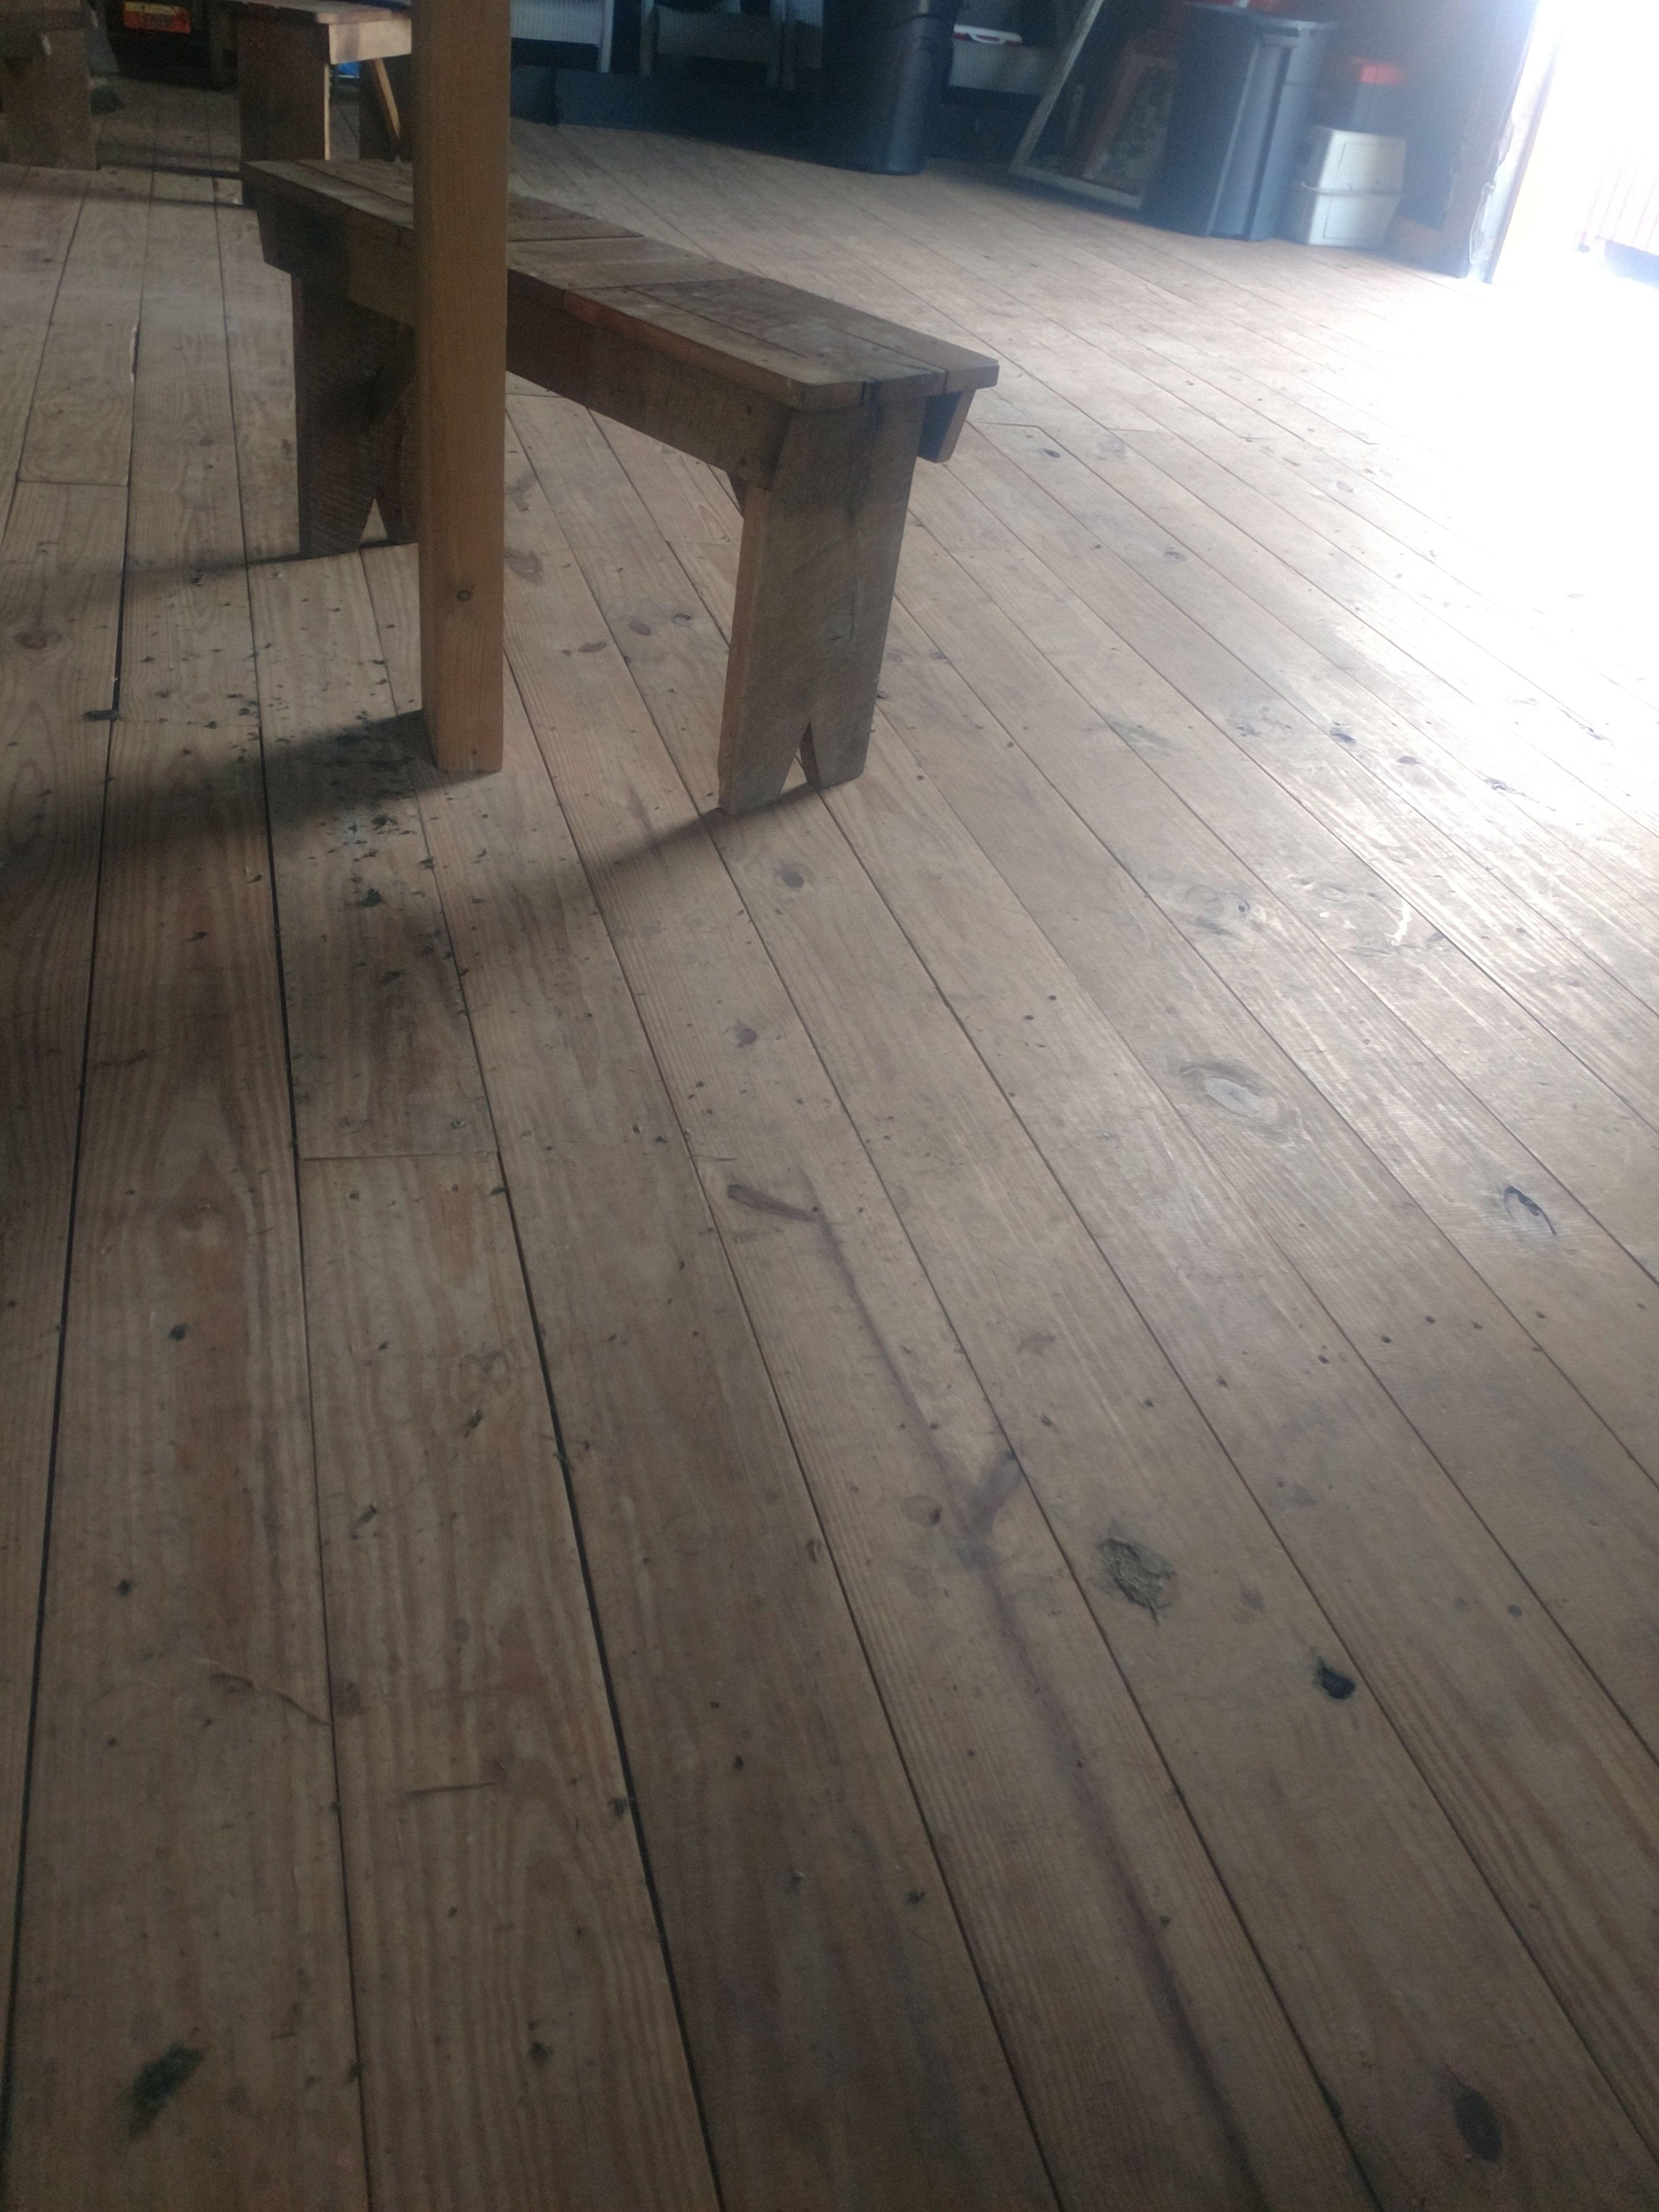 New Local Pine Tongue Groove 1 1 2 X 8 Bench Made Out Of Original Chestnut Floor Flooring Hardwood Hardwood Floors